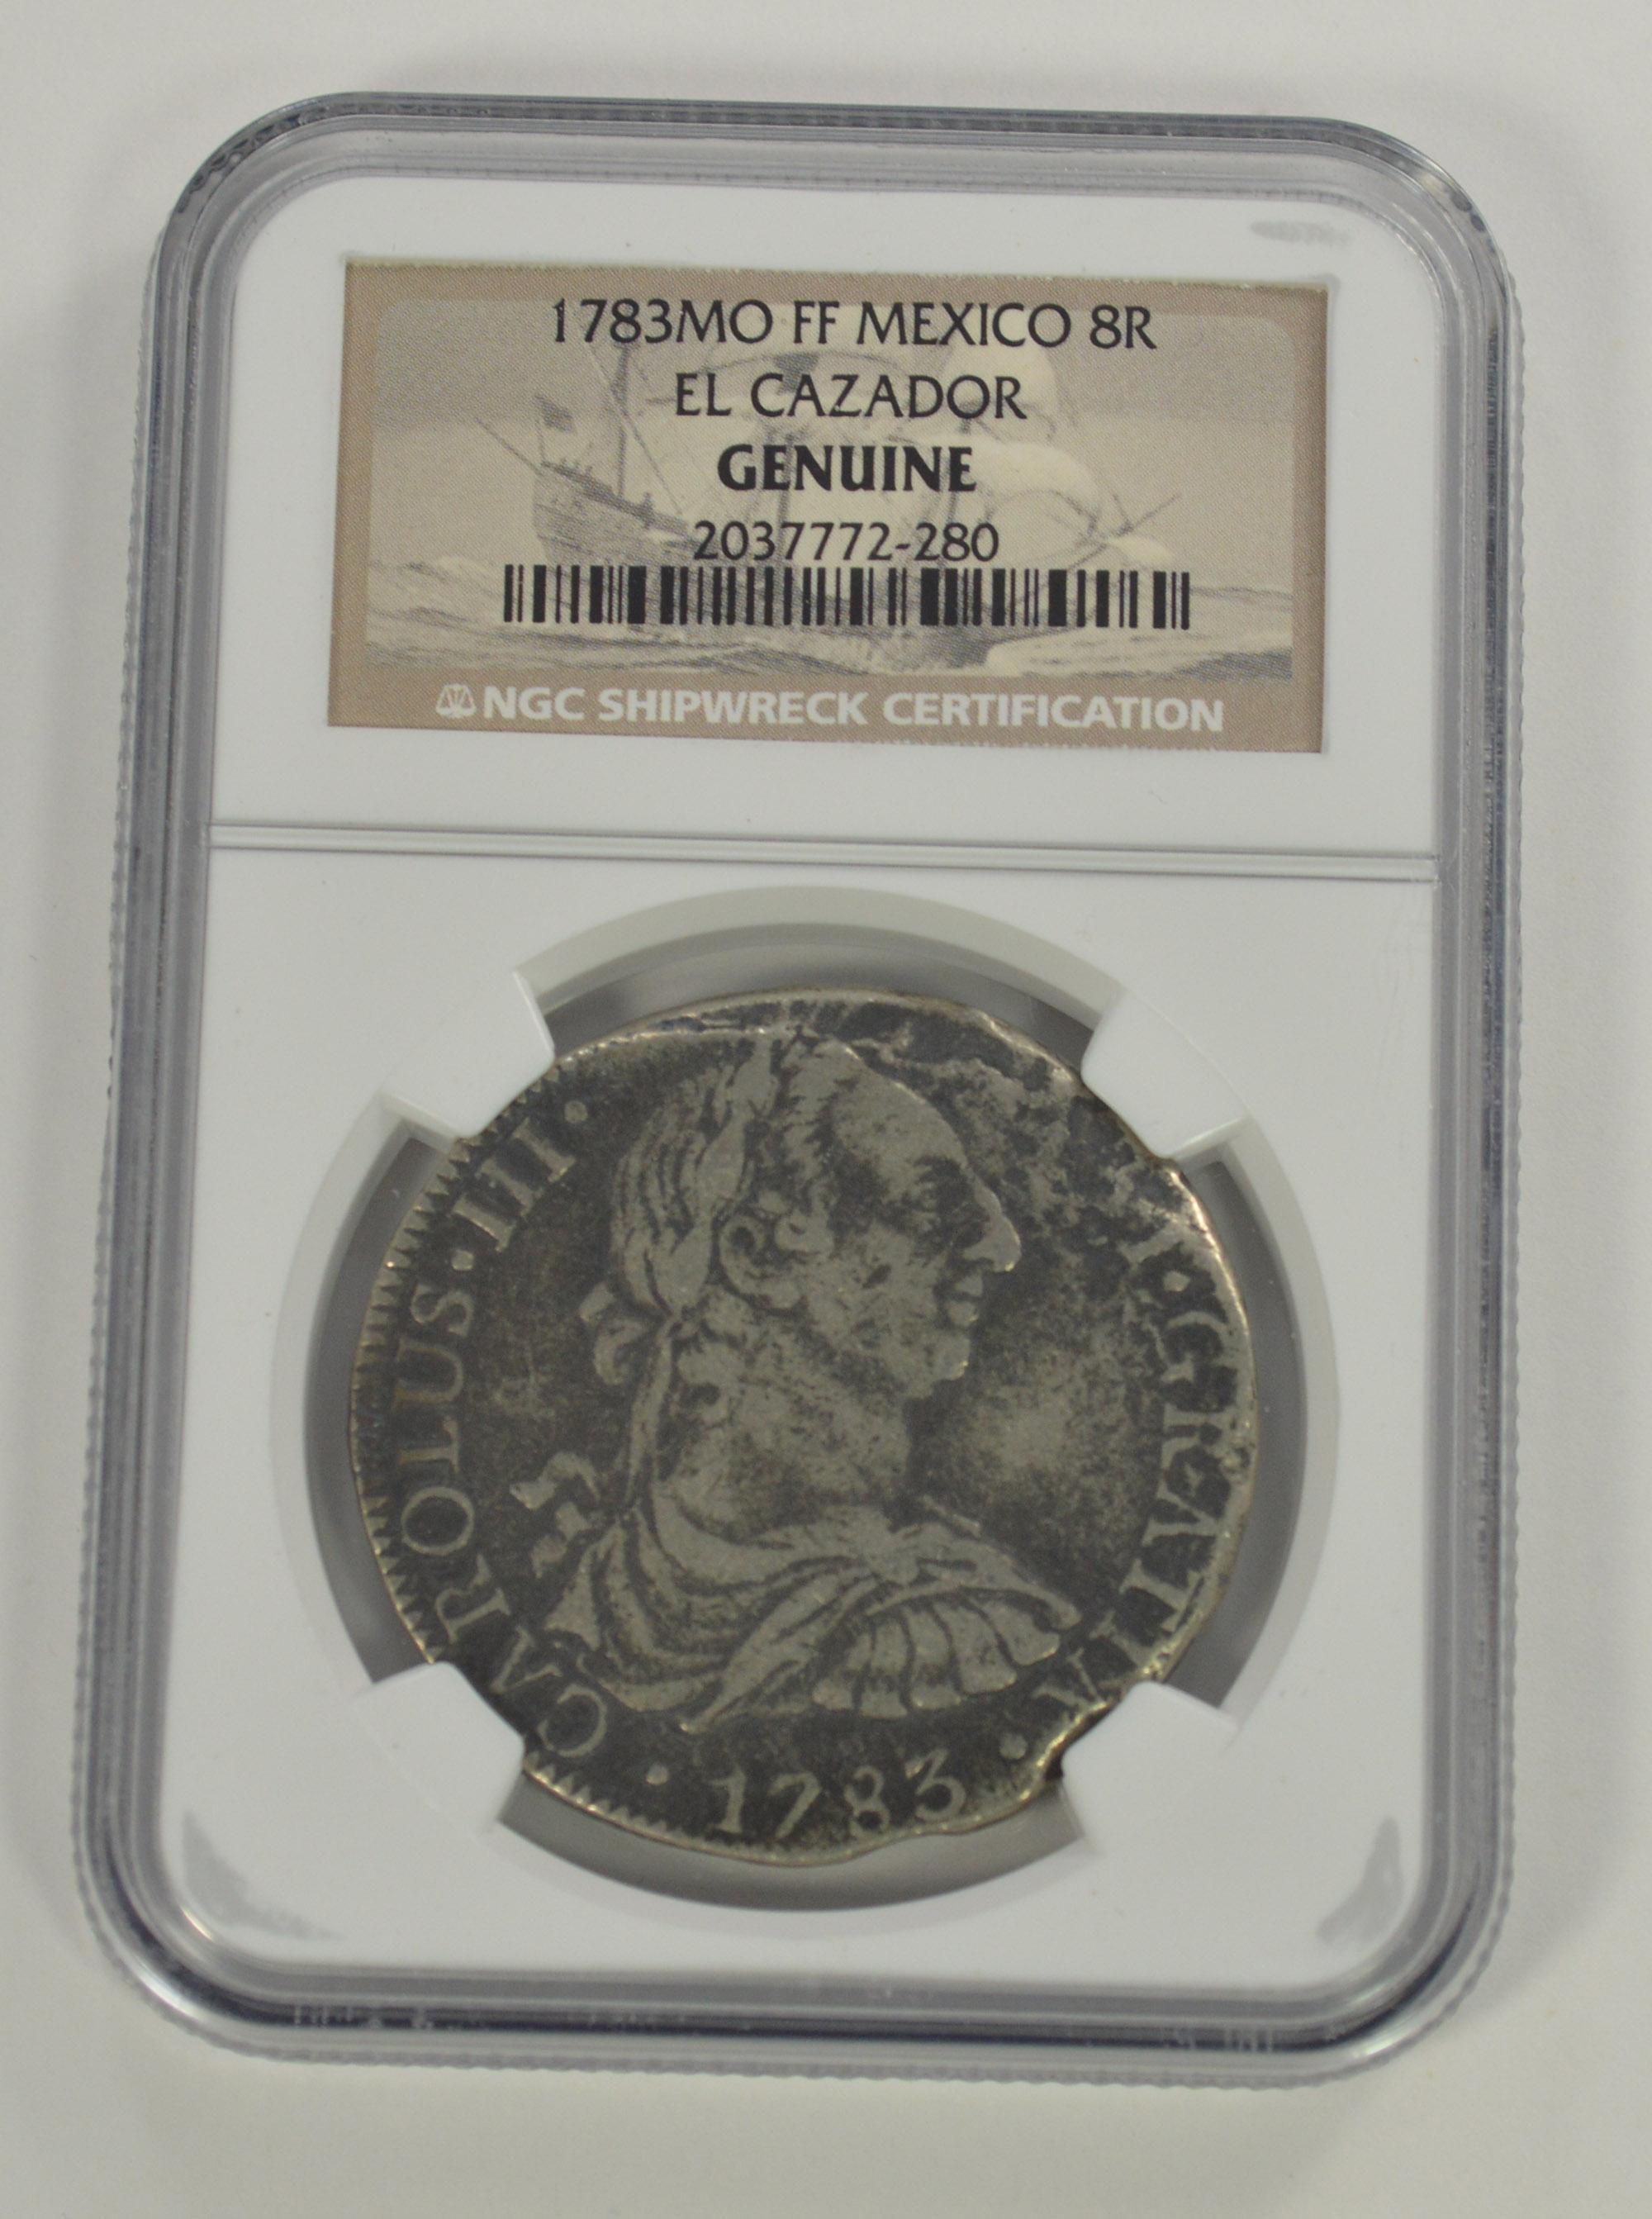 1783 MO FF Mexico Genuine Shipwreck El Cazador 8 Reales Silver Coin NGC